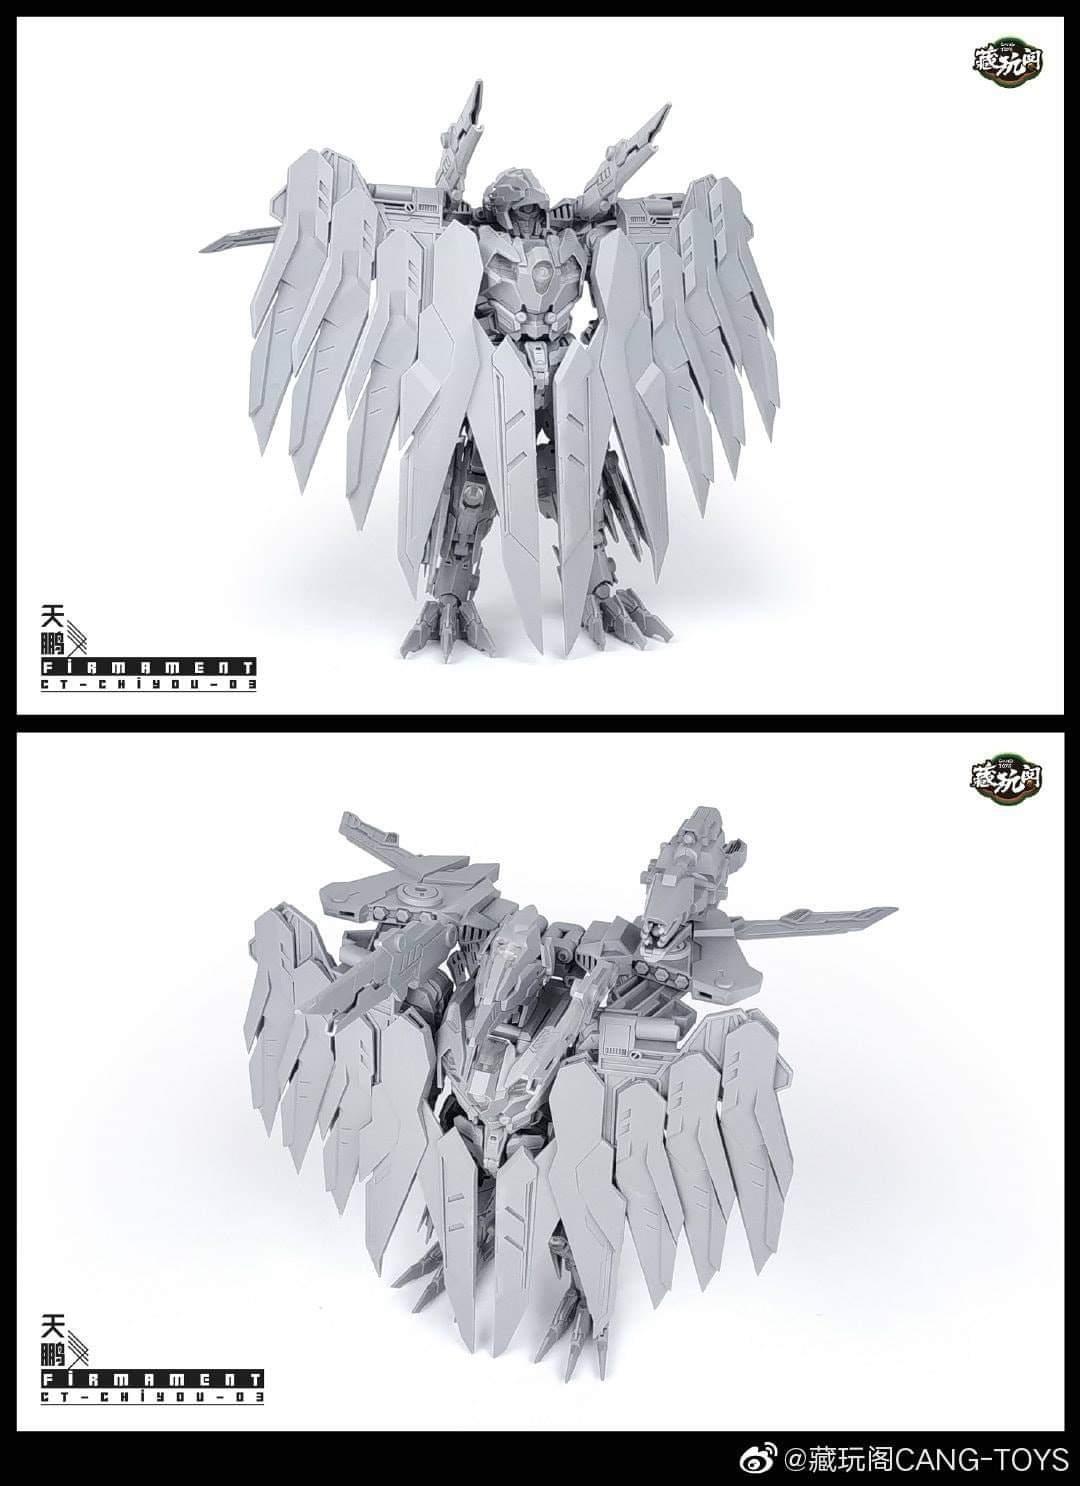 [Cang Toys][Toyworld] Produit Tiers - Thunderking/Chiyou - aka Predaking/Prédaroi (Prédacons) - Page 3 ZjqJVkSy_o